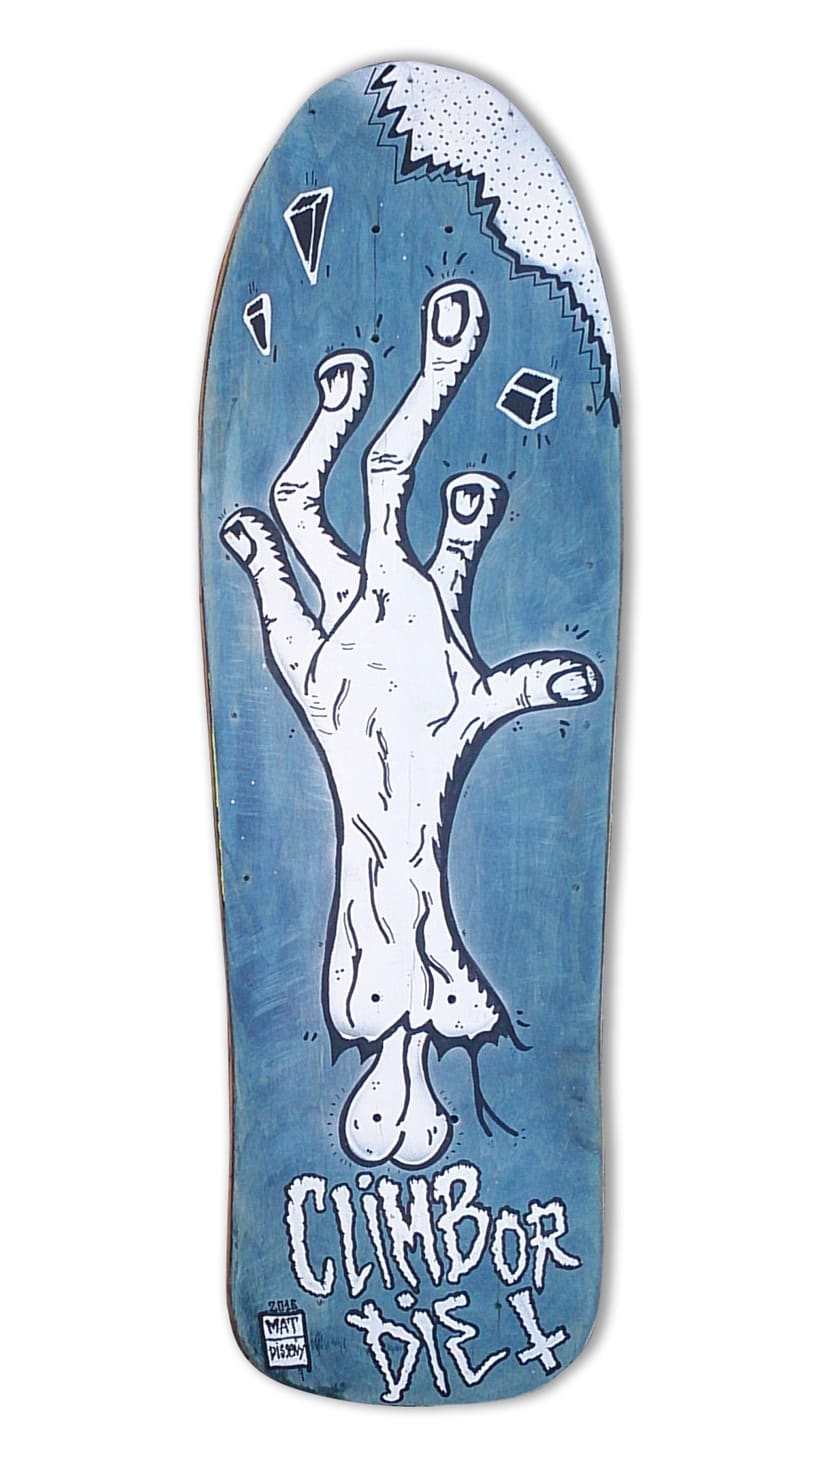 Skateboard • Climb or die #SkateArt -1